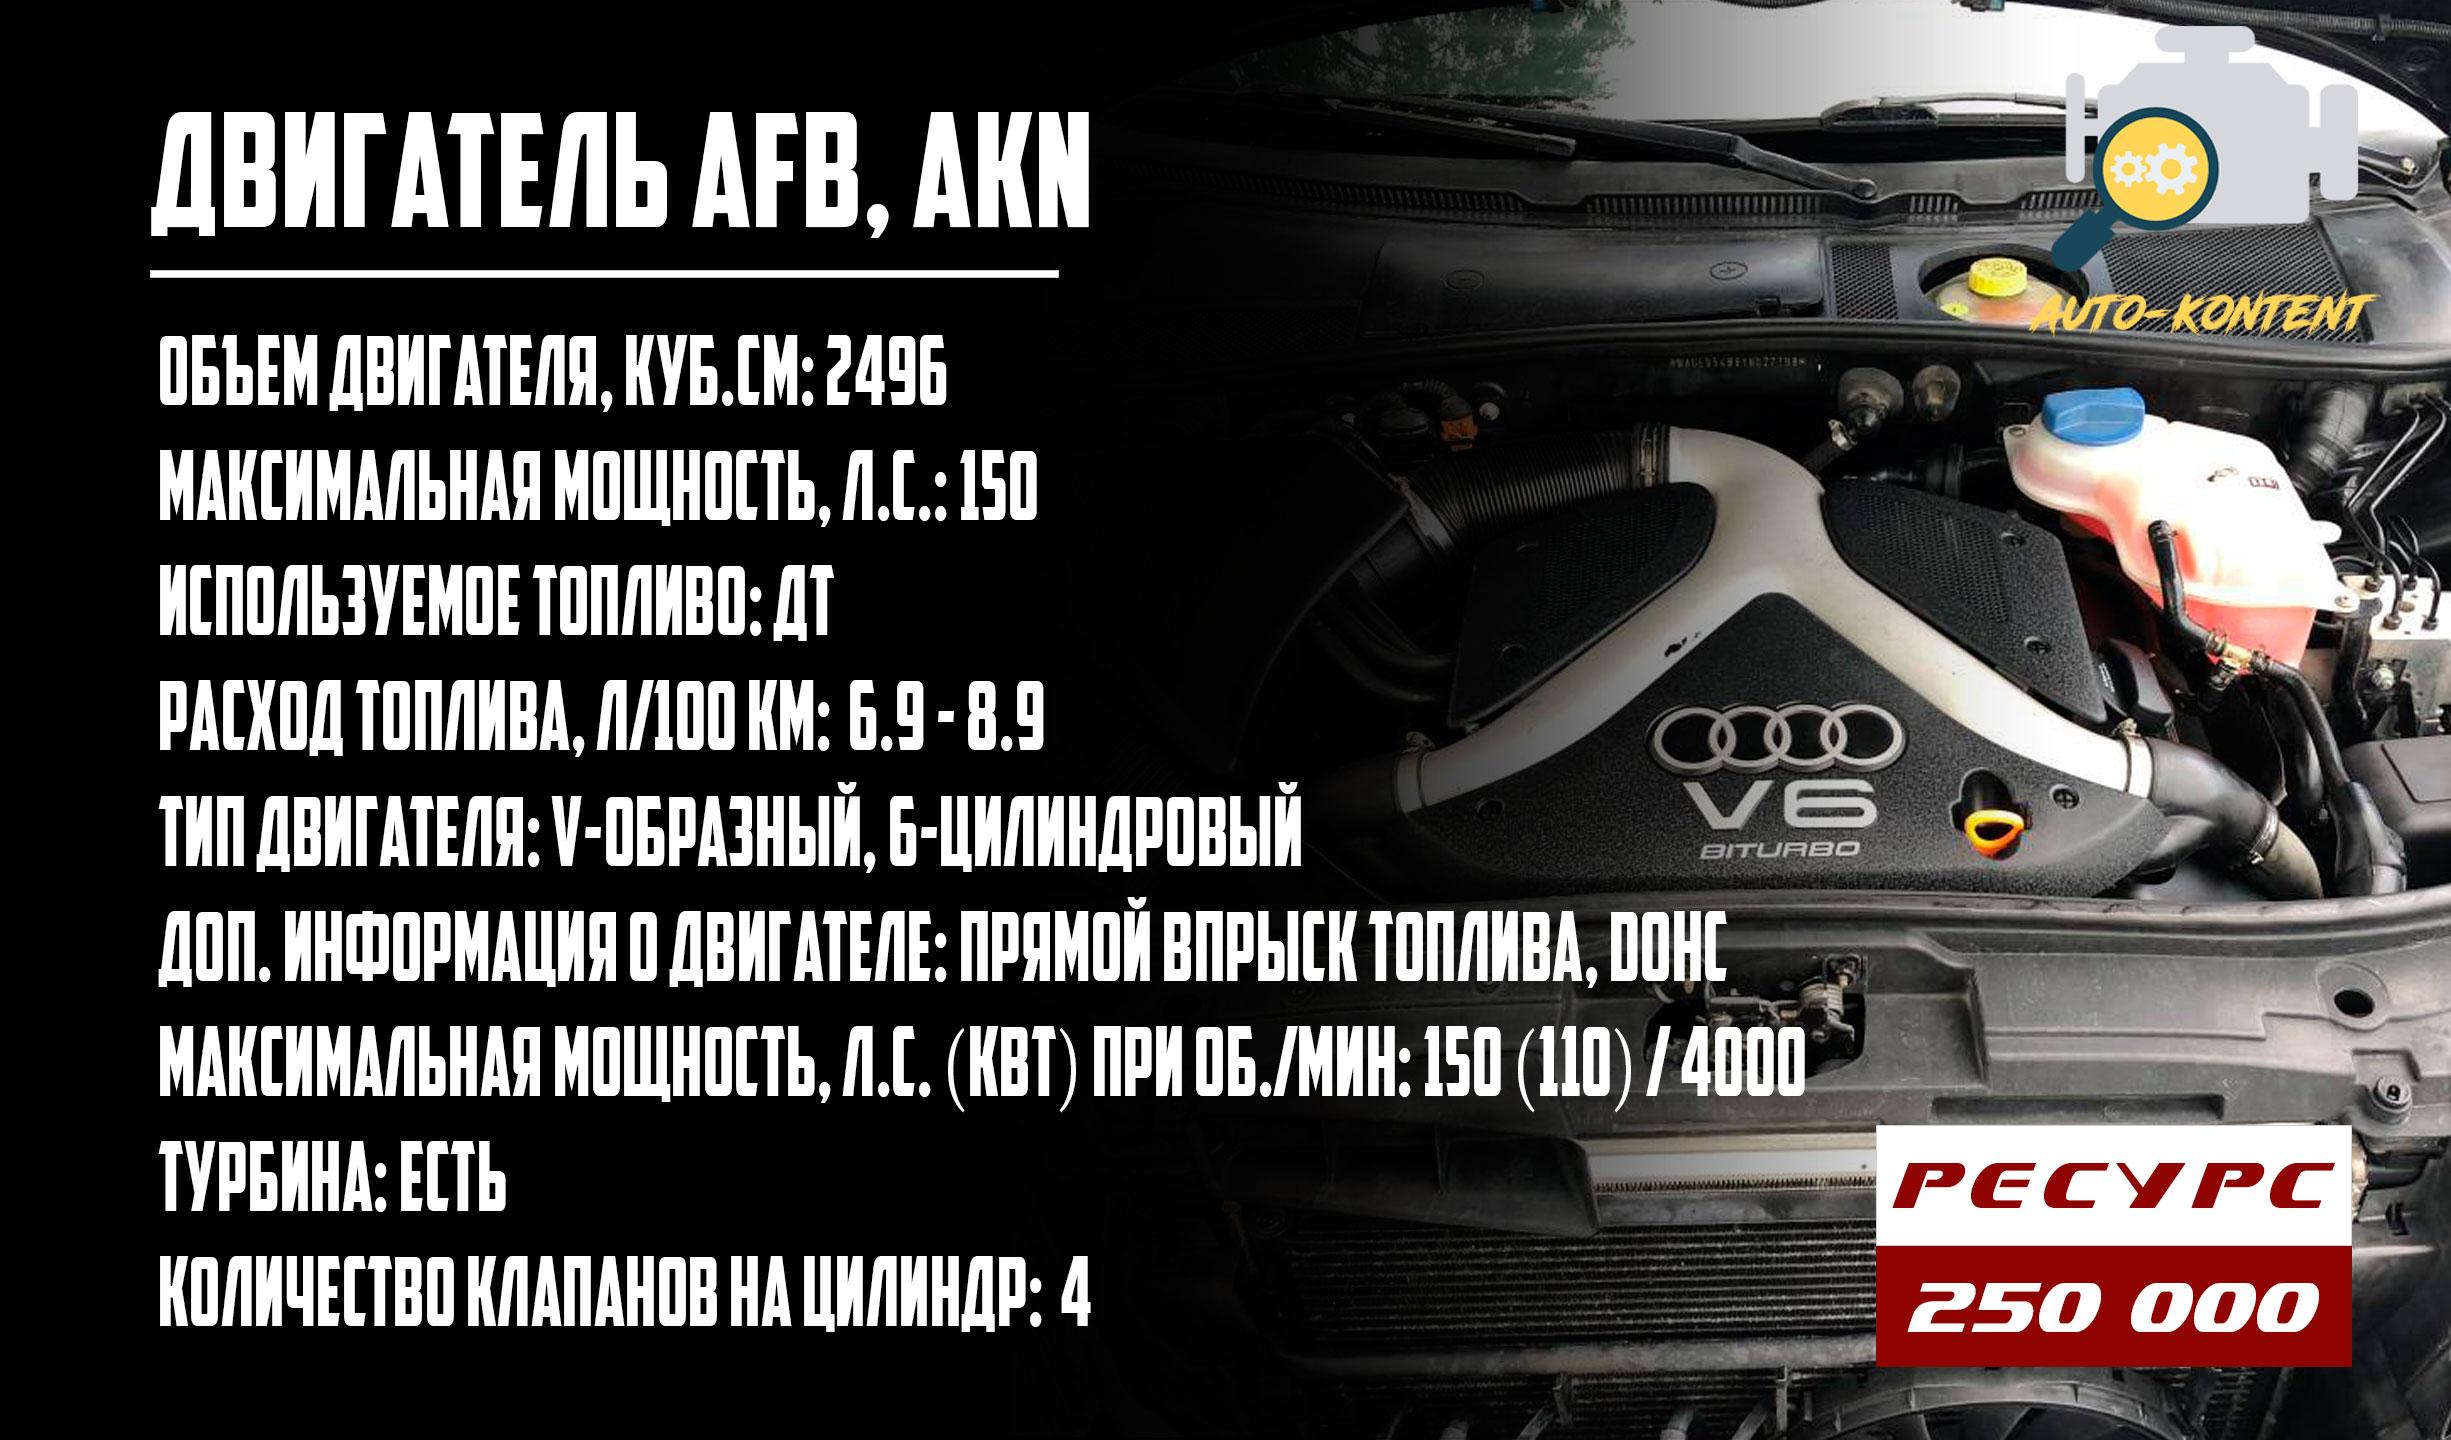 AFB, AKN